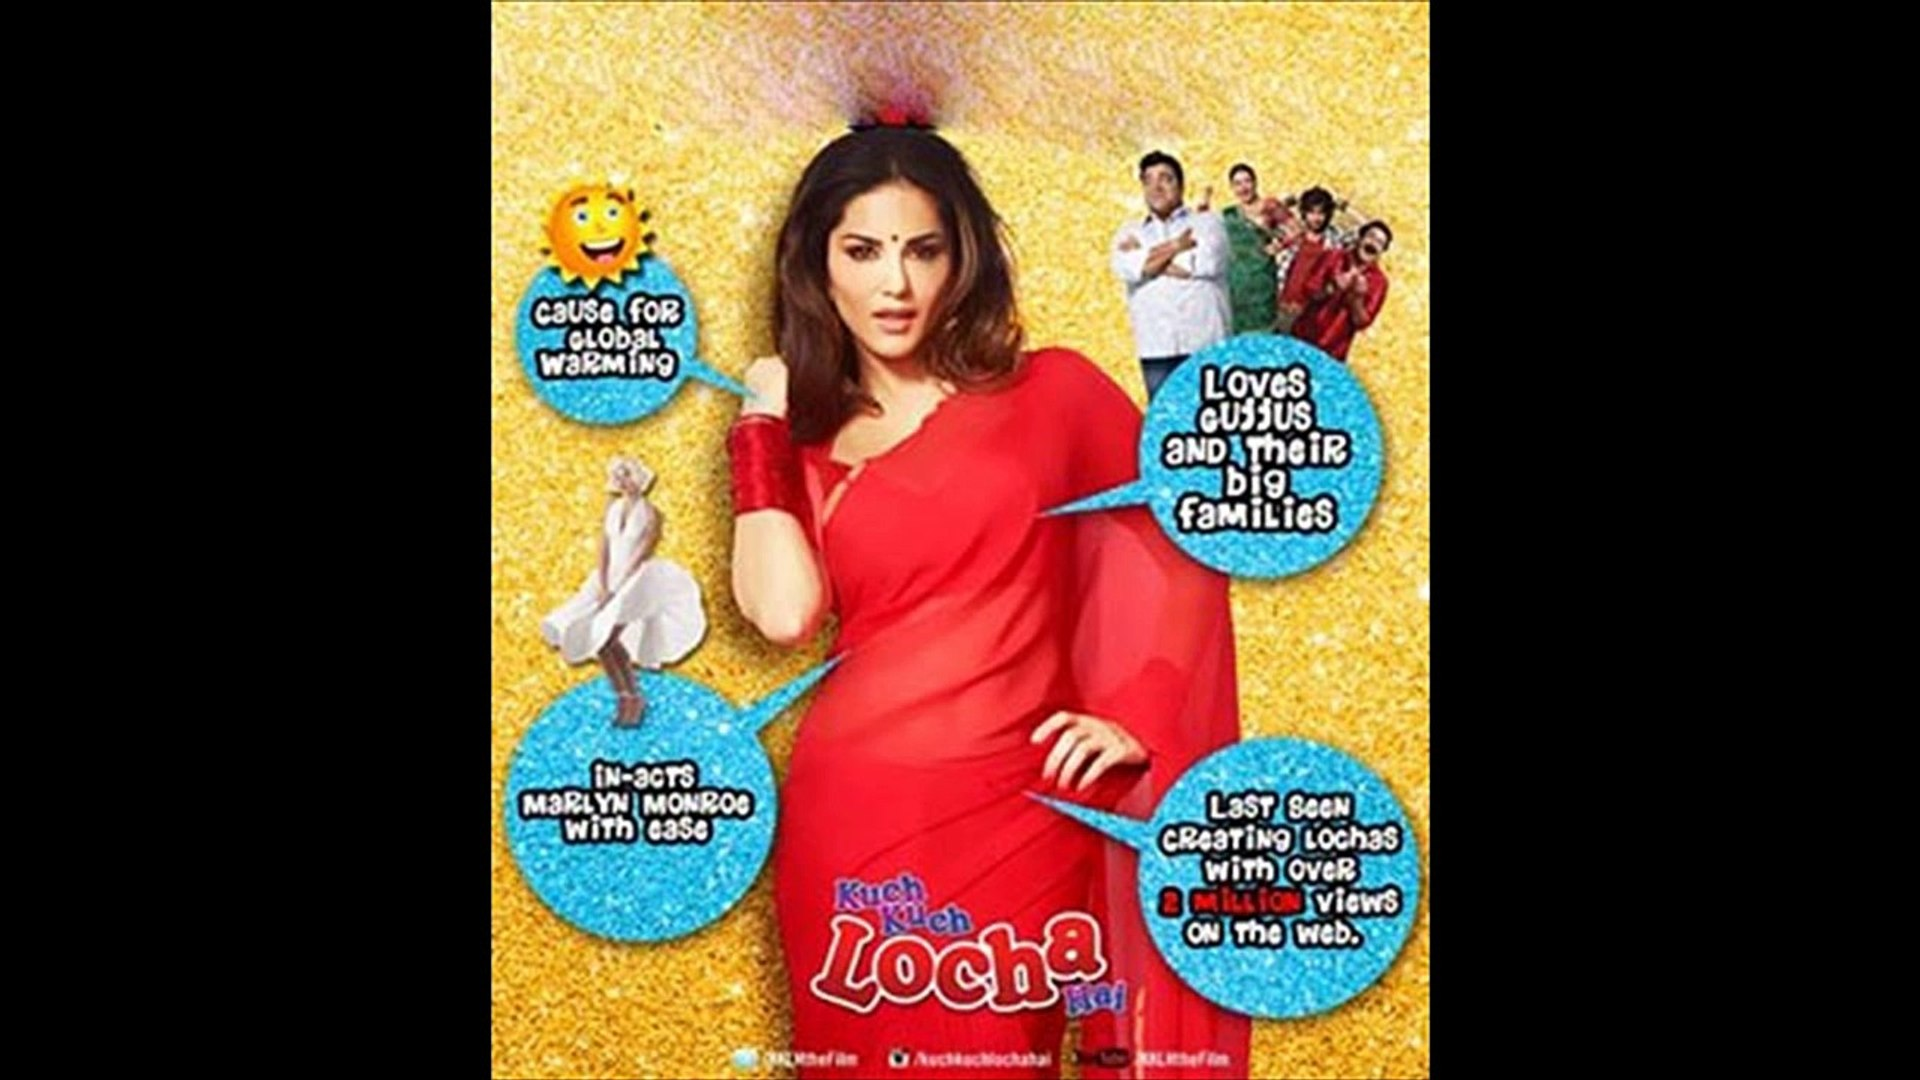 Kuch kuch locha hai full movie online